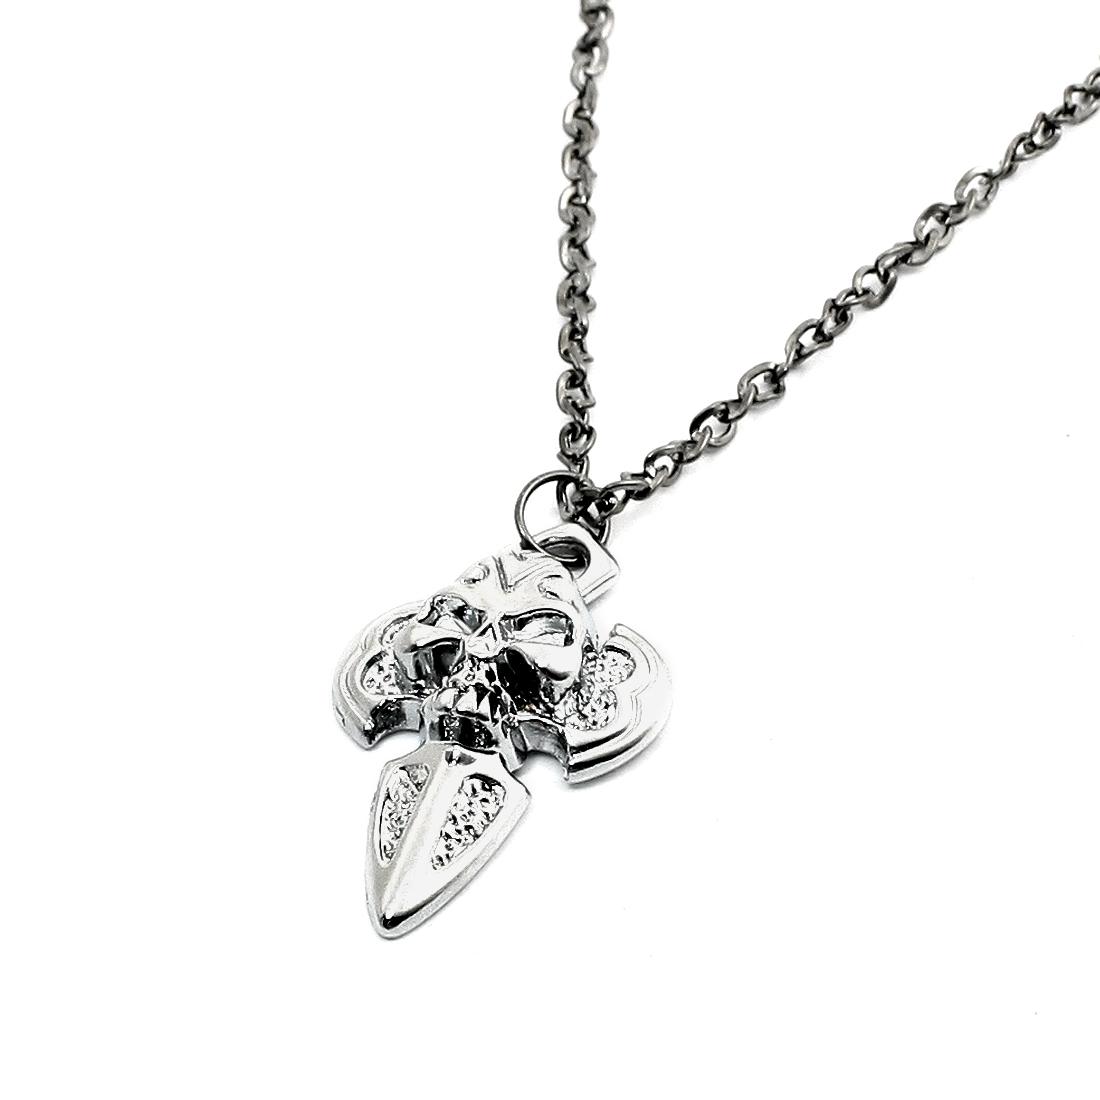 Hook Closure Silver Tone Skull Decor Cross Pendant Link Chain Necklace for Men